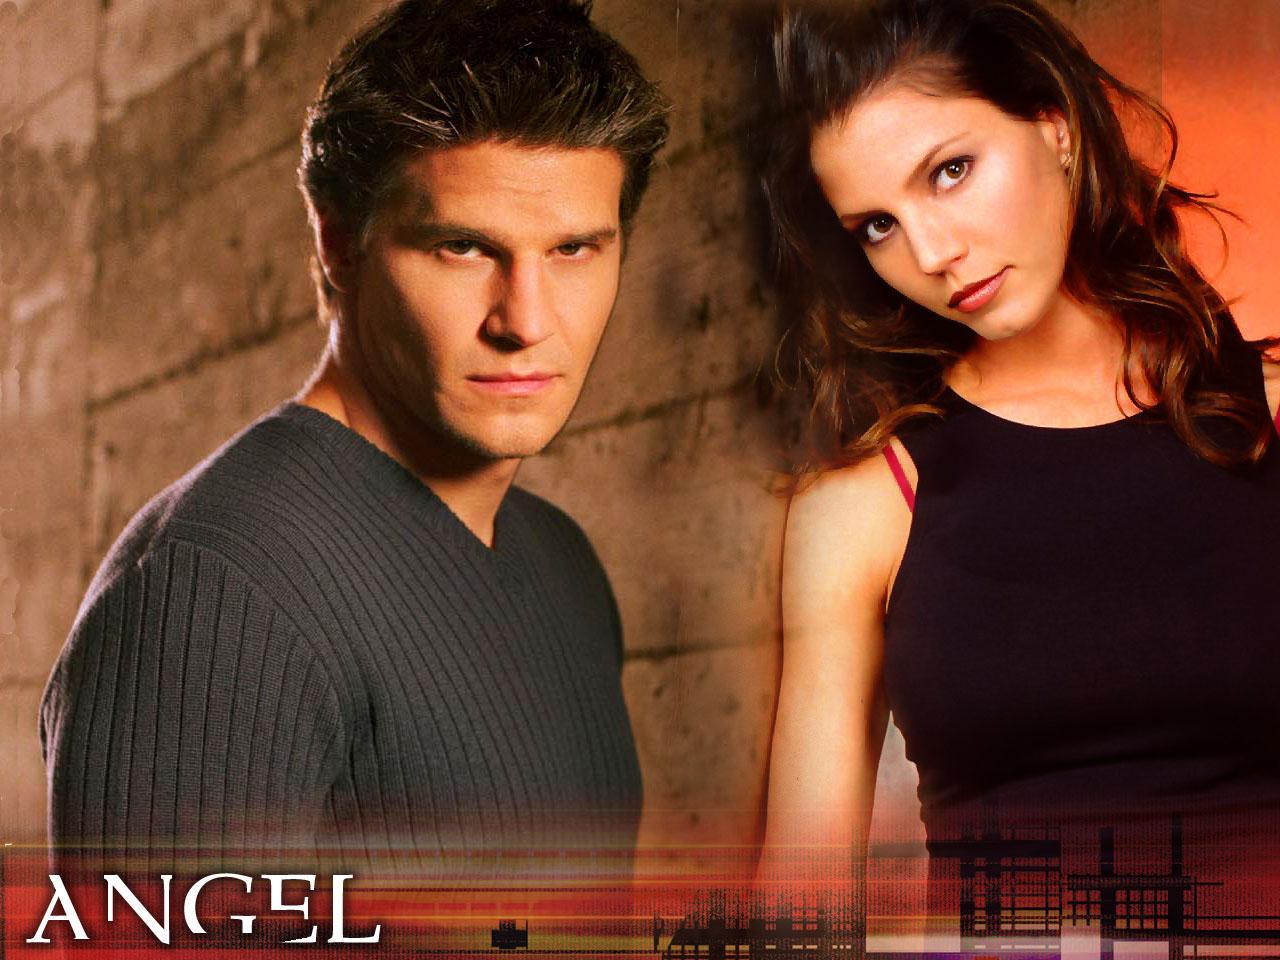 Angel movie